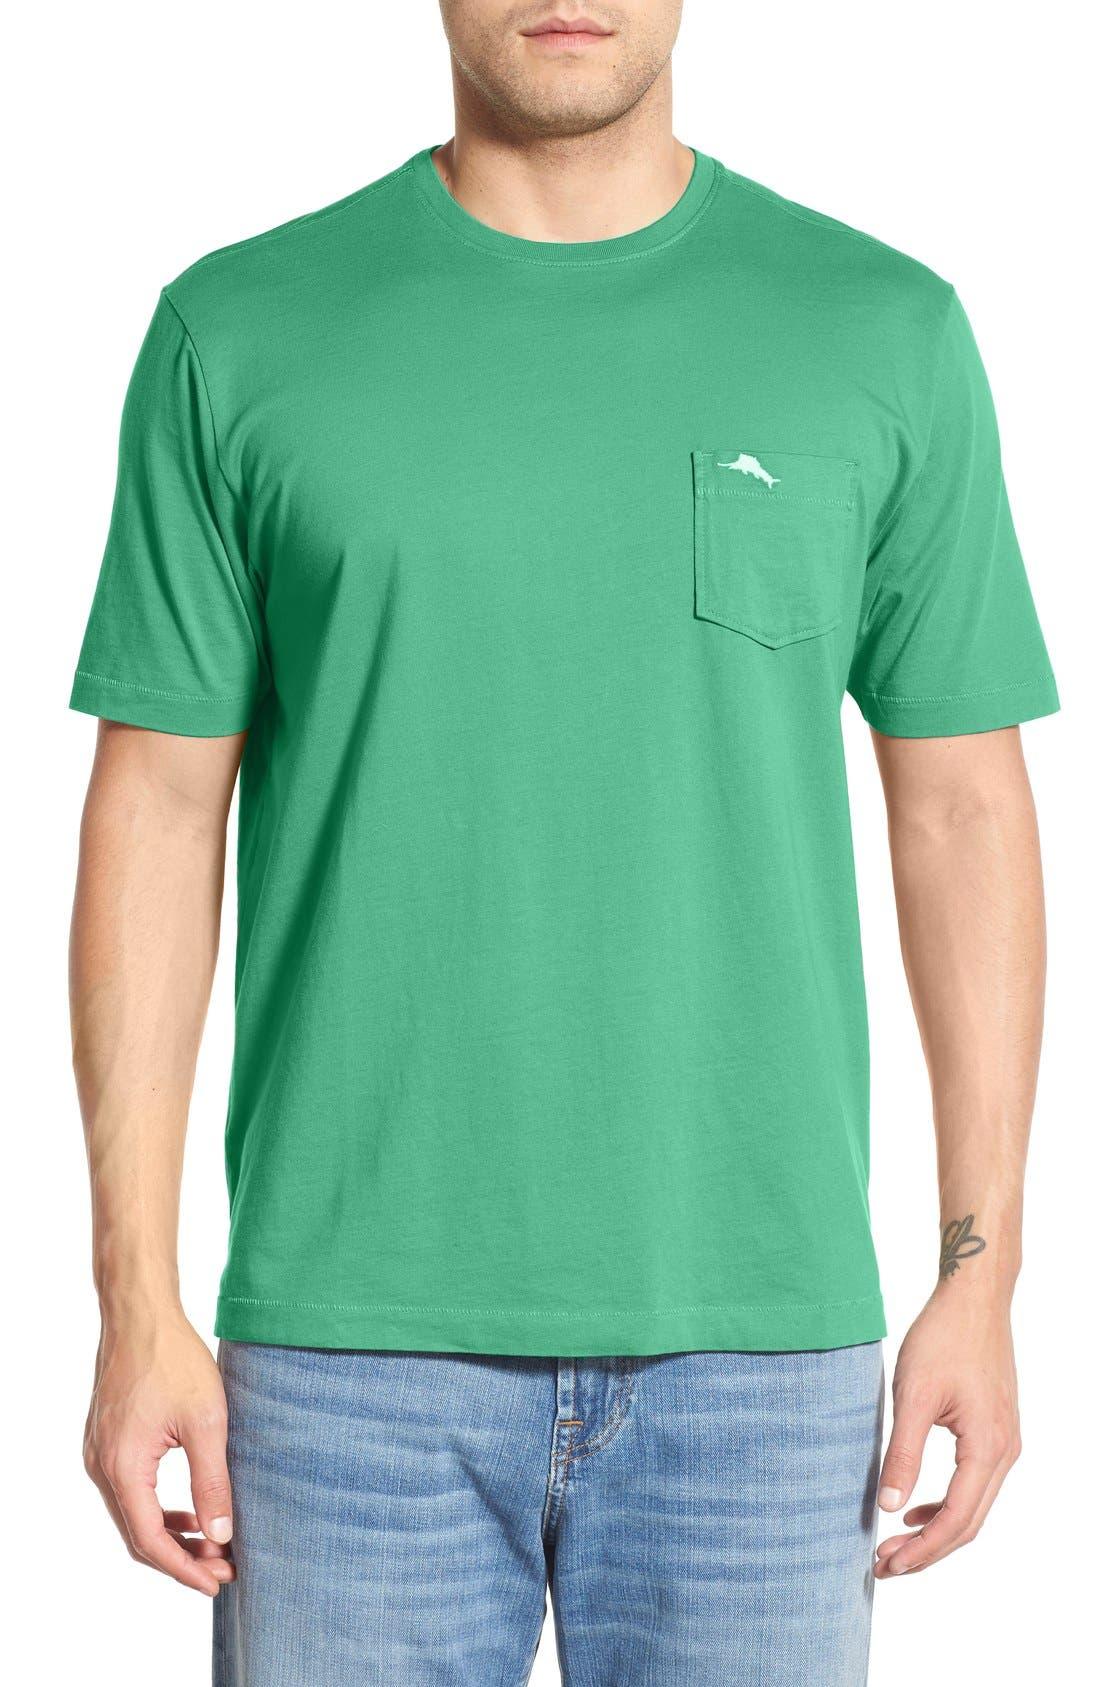 Alternate Image 1 Selected - Tommy Bahama New Bali Sky Pima Cotton Pocket T-Shirt